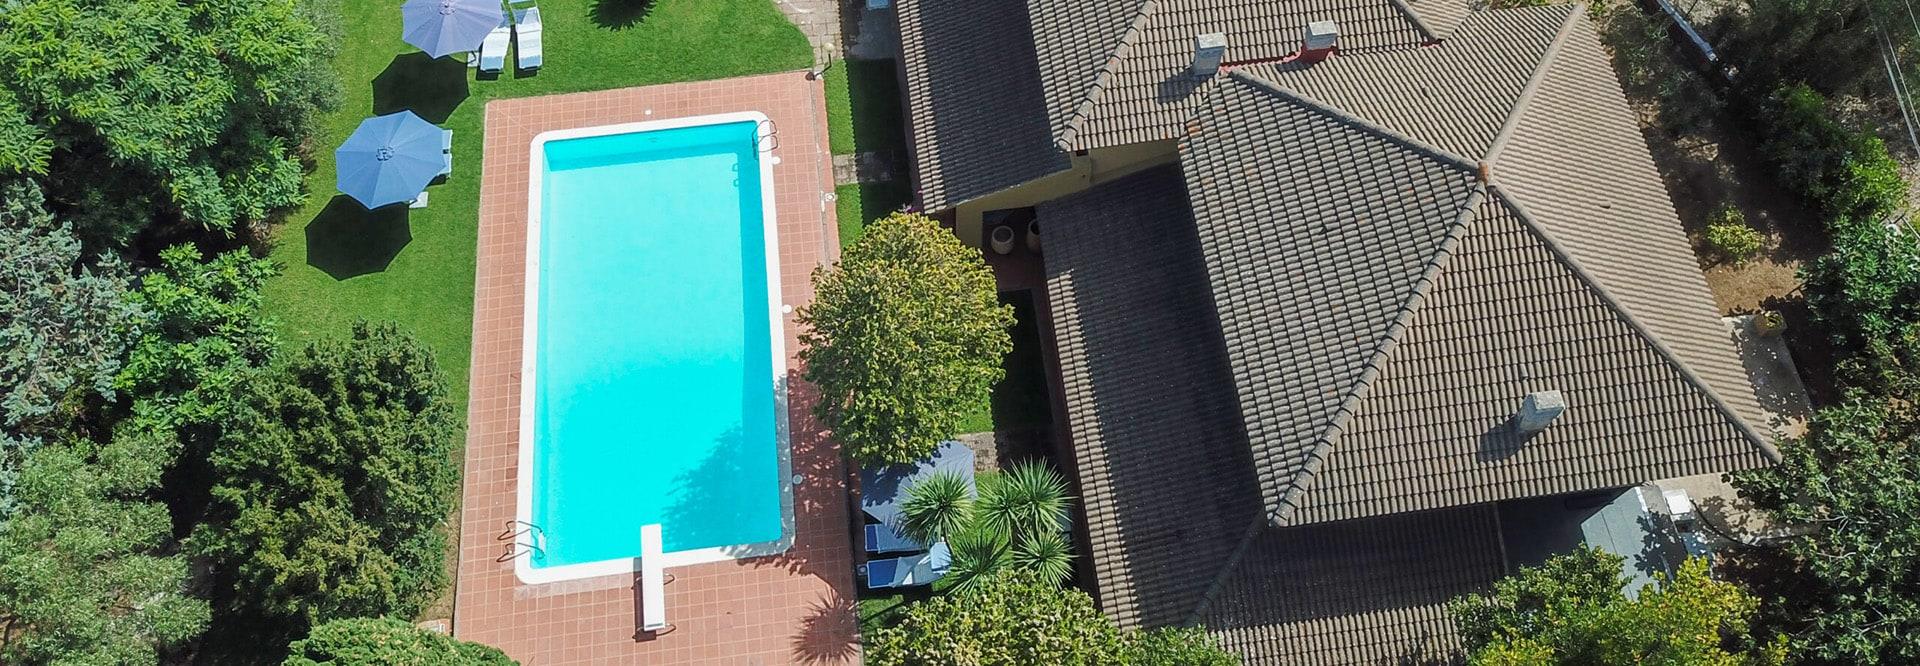 Domus 81 luxury villa